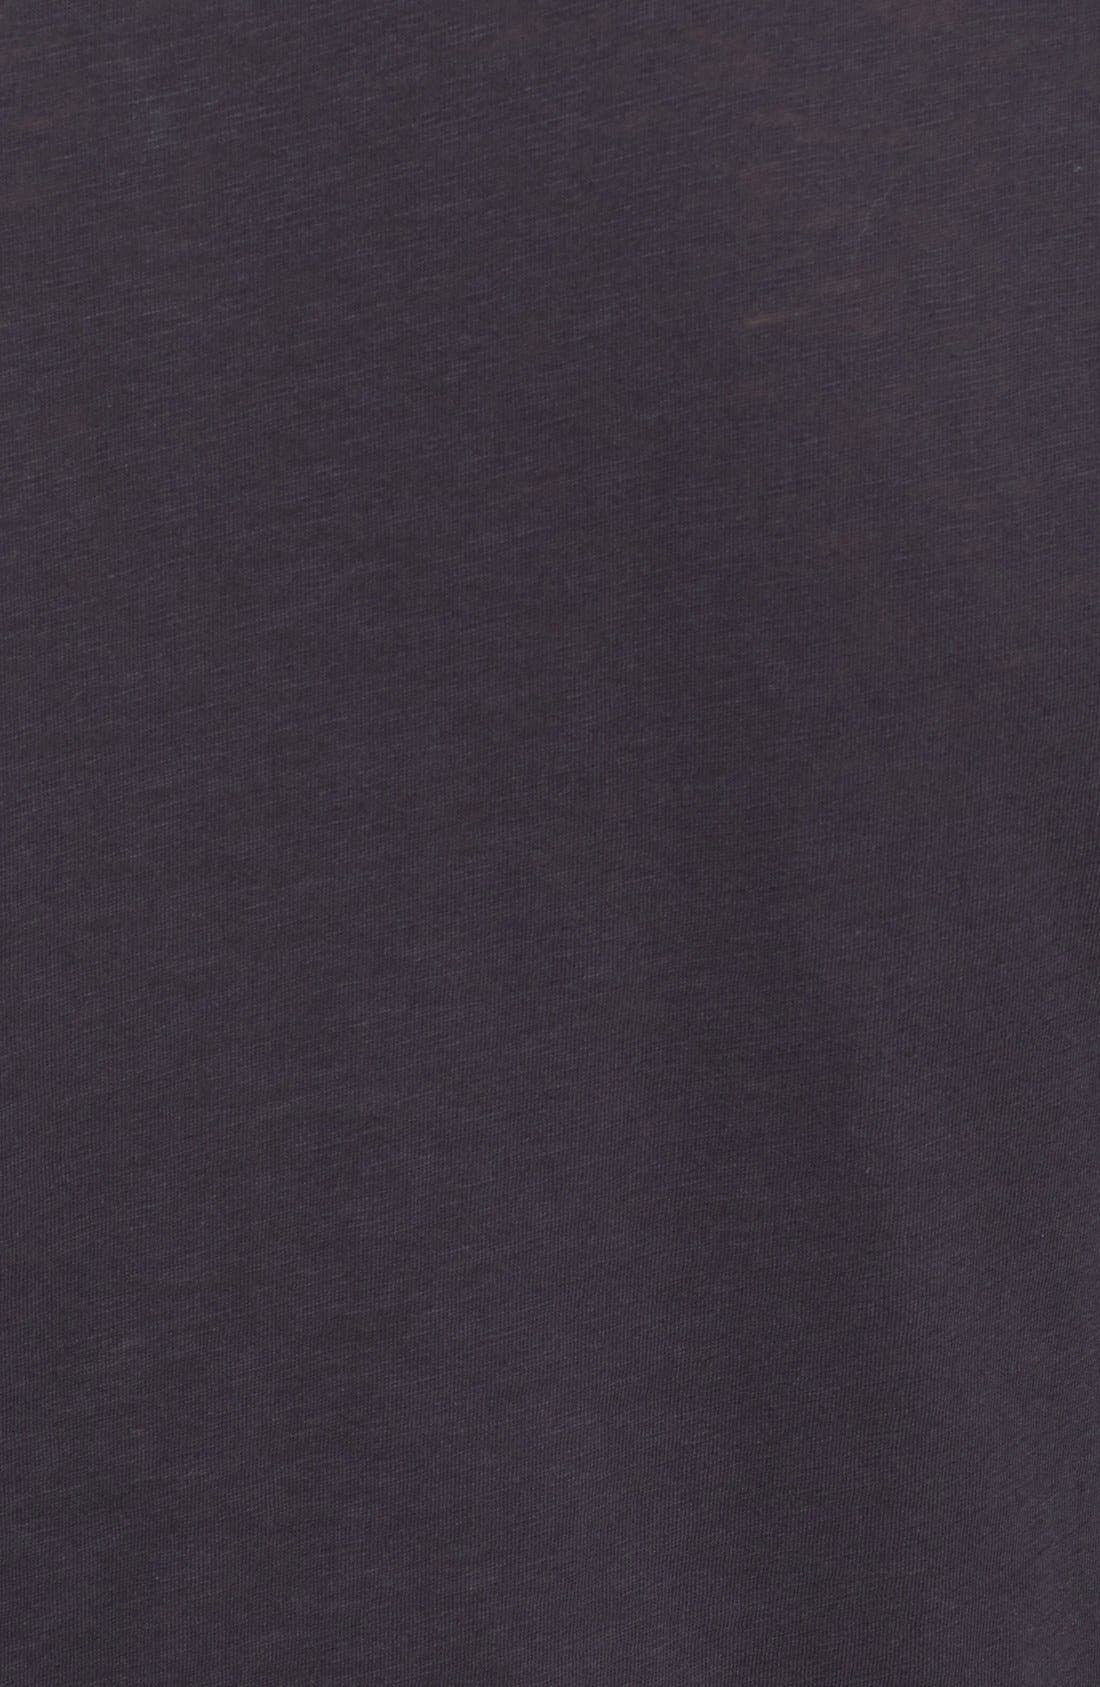 Alternate Image 3  - French Connection Long Sleeve Slub Cotton Henley